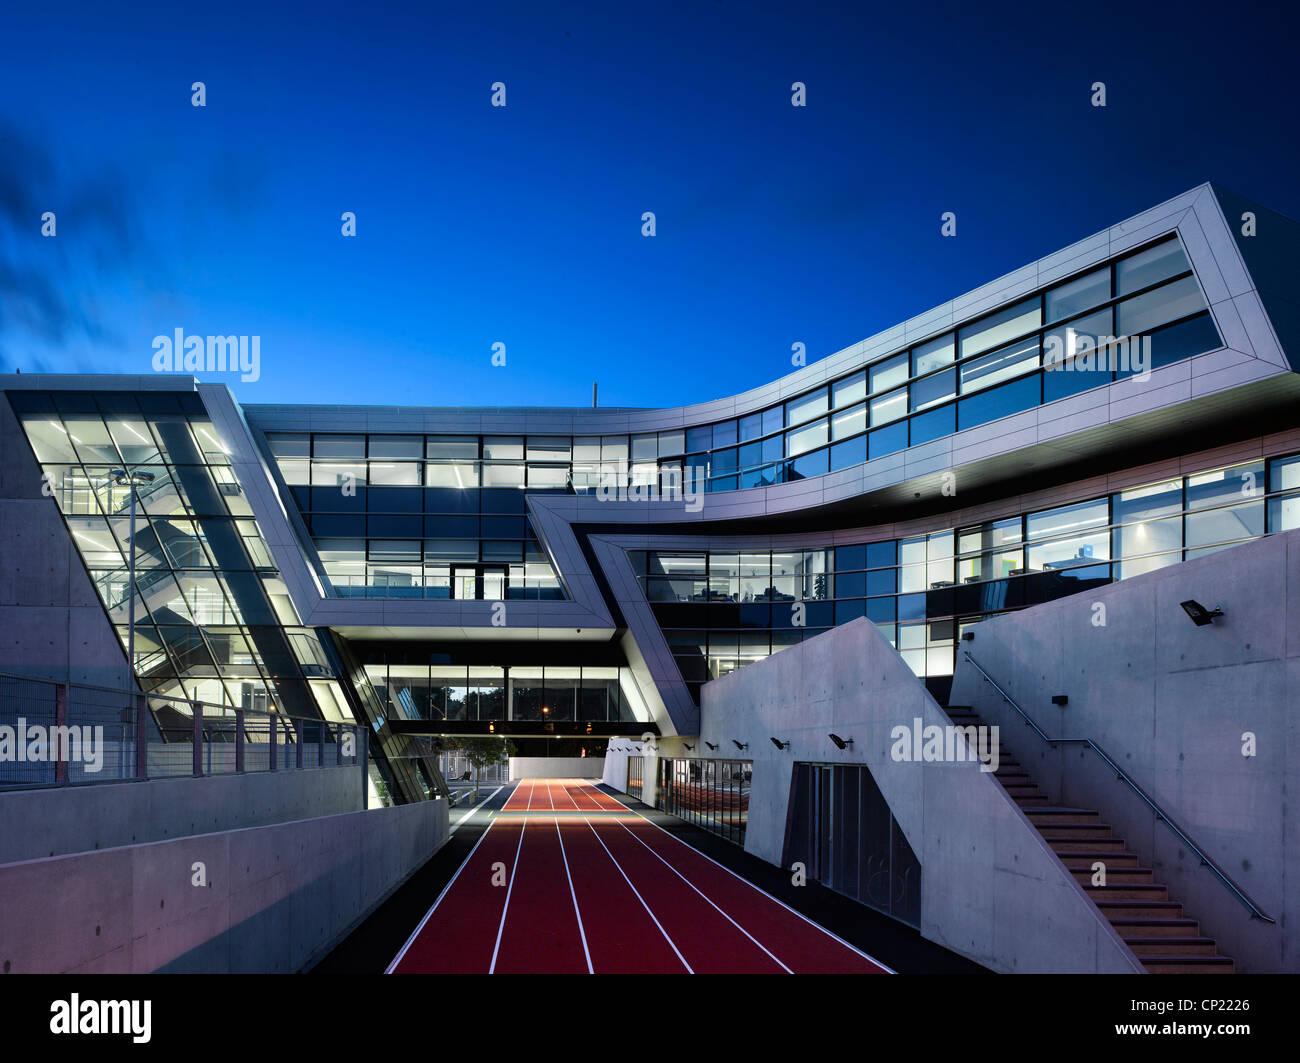 Night Exterior of Evelyn Grace Academy, a school by Zaha Hadid Stock Photo